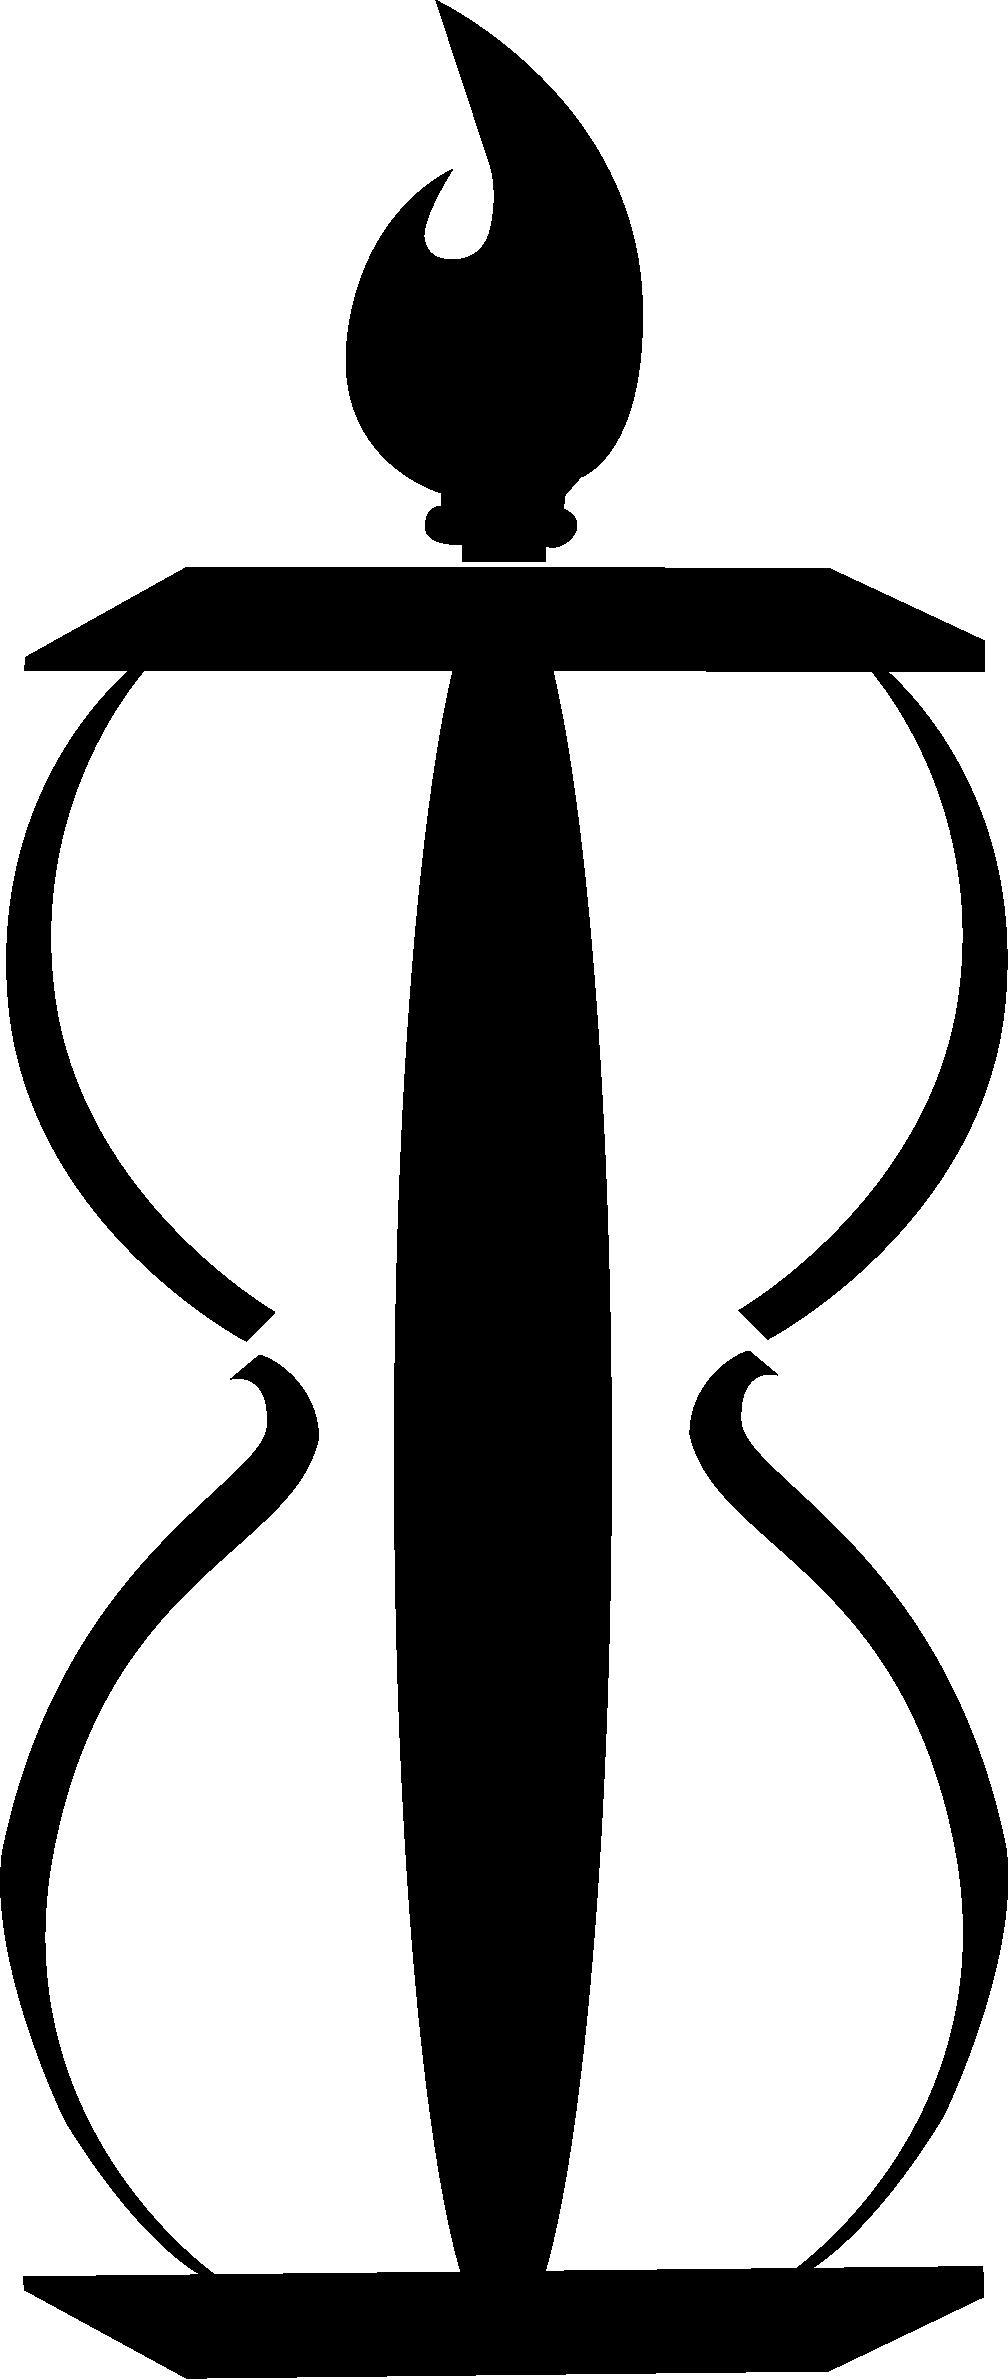 OSK1977